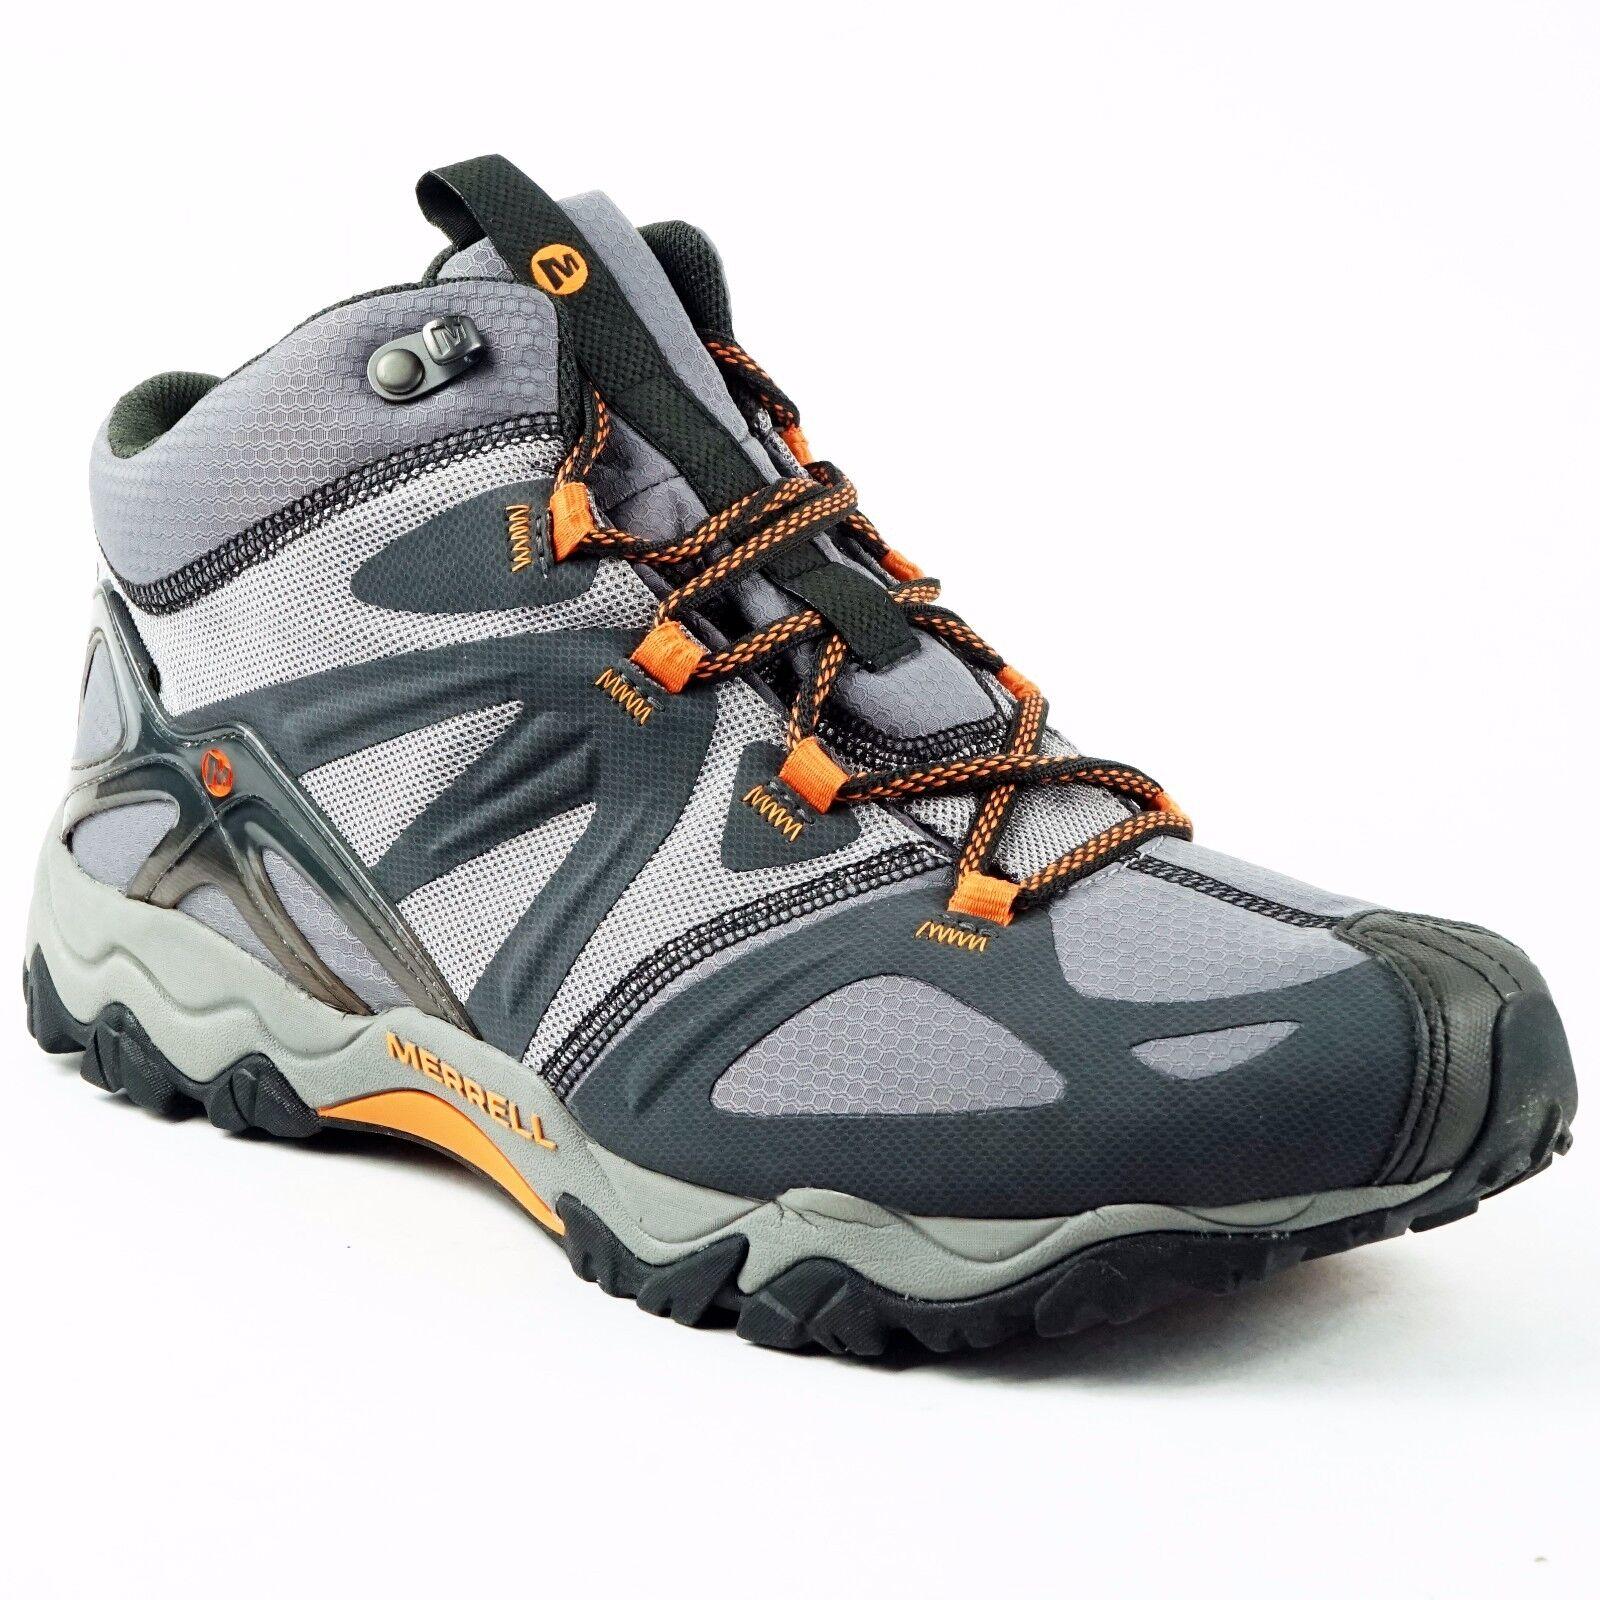 Merrell Mens Grassbow Mid Gore-tex grigioTrekking scarpe Walking Hiking scarpe US11